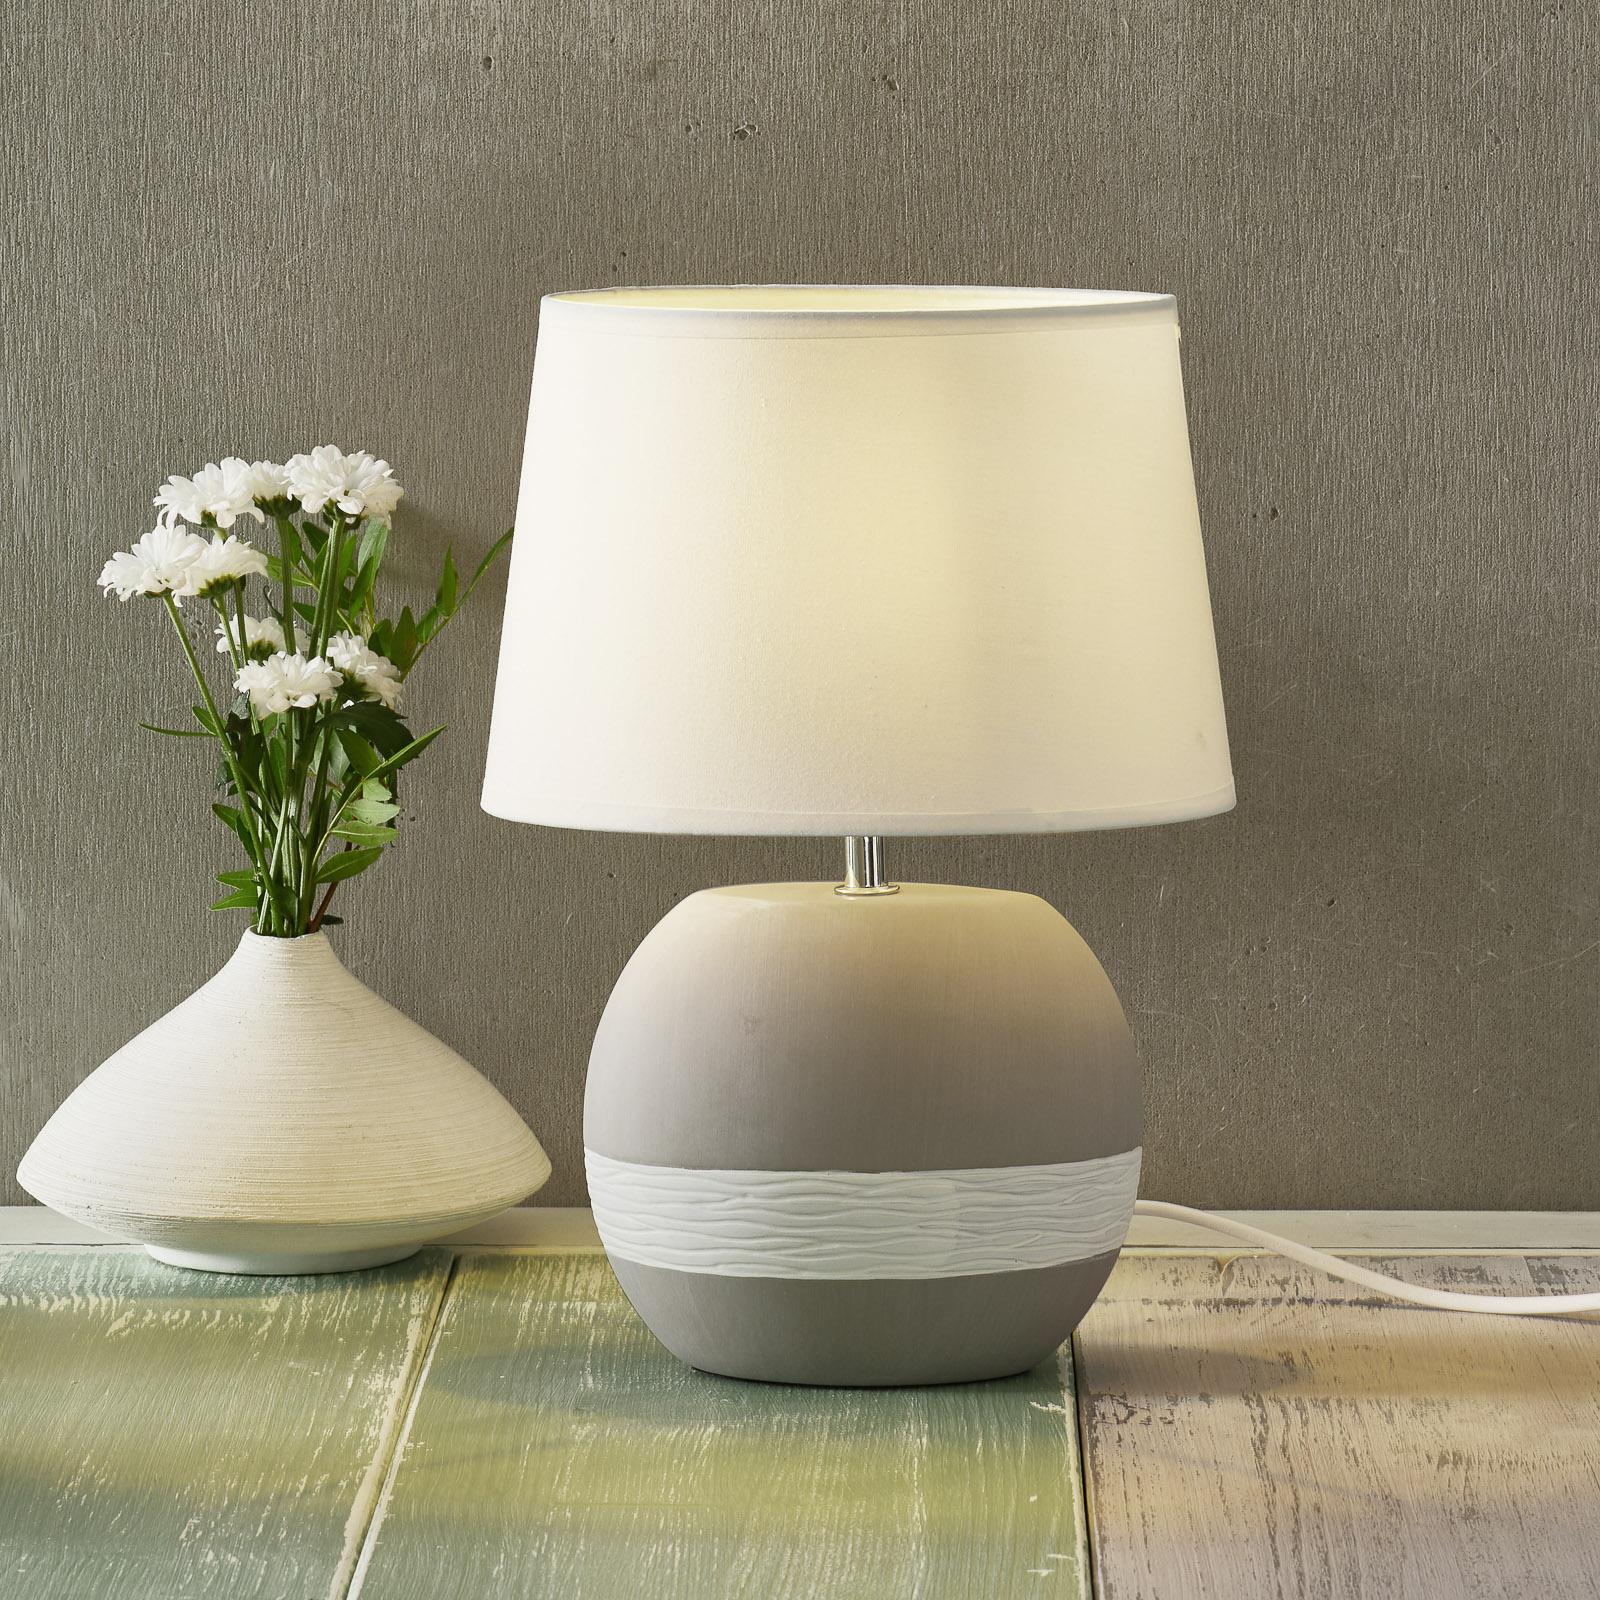 Lampada da tavolo Creto paralume tessuto bianco